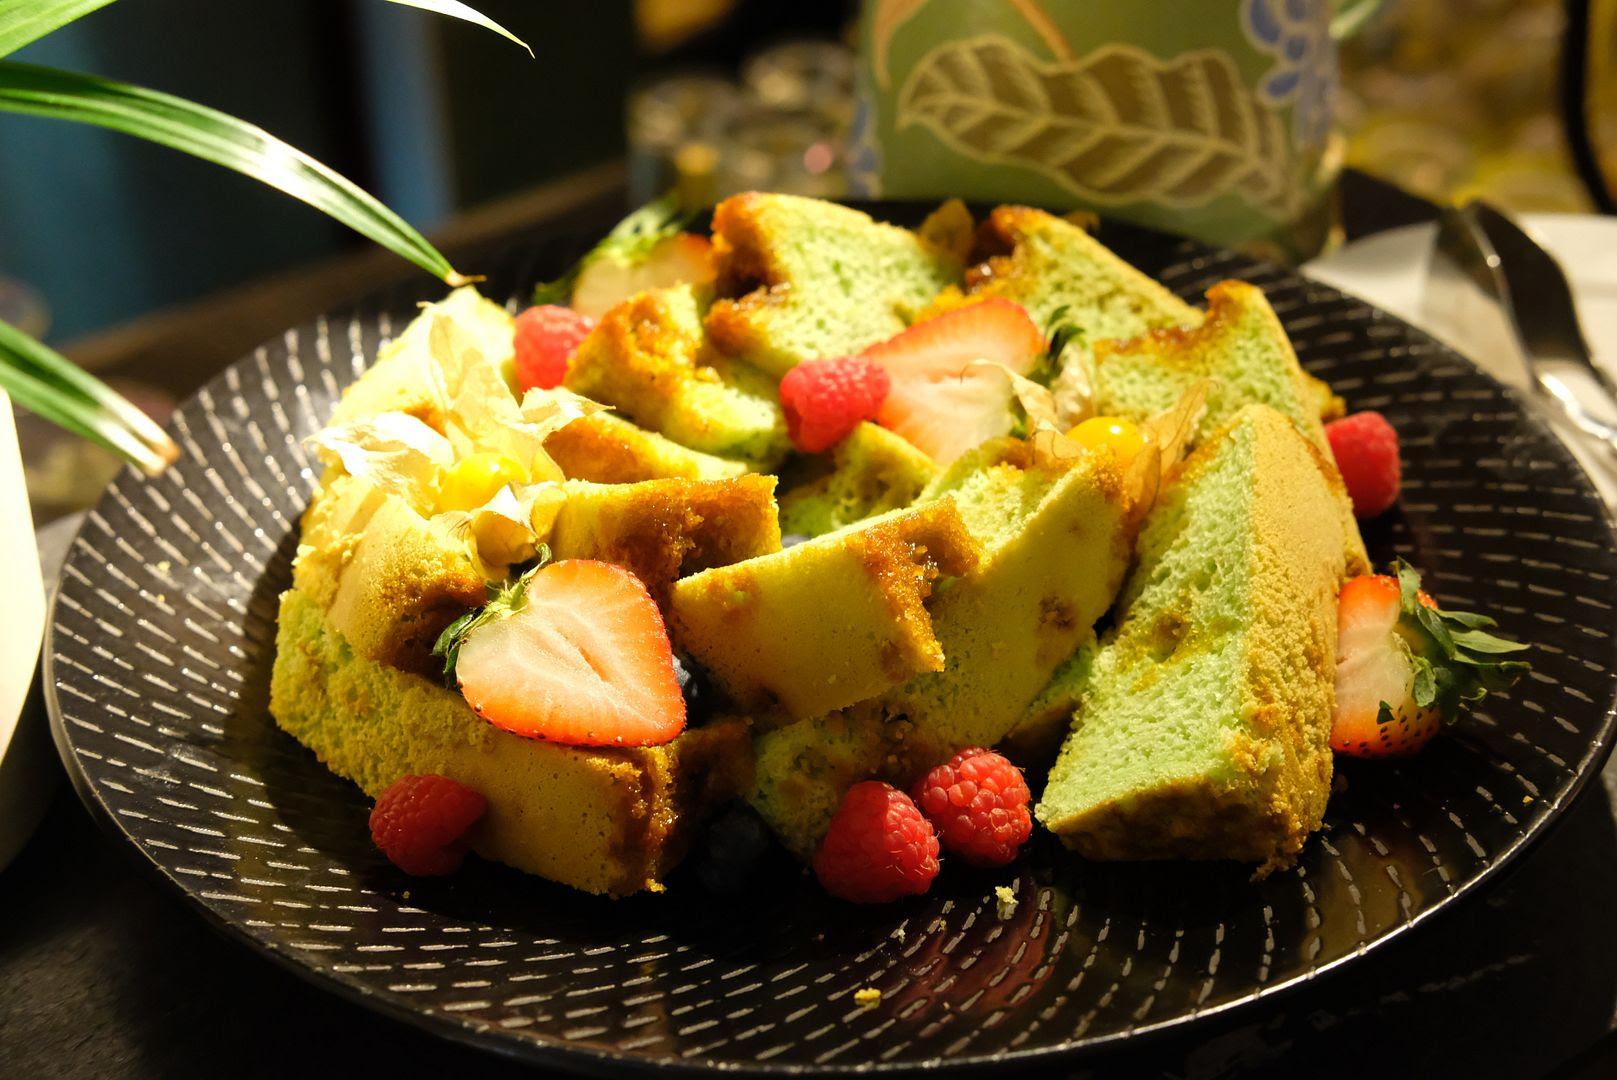 photo Pan Pacific High Tea Buffet 10.jpg